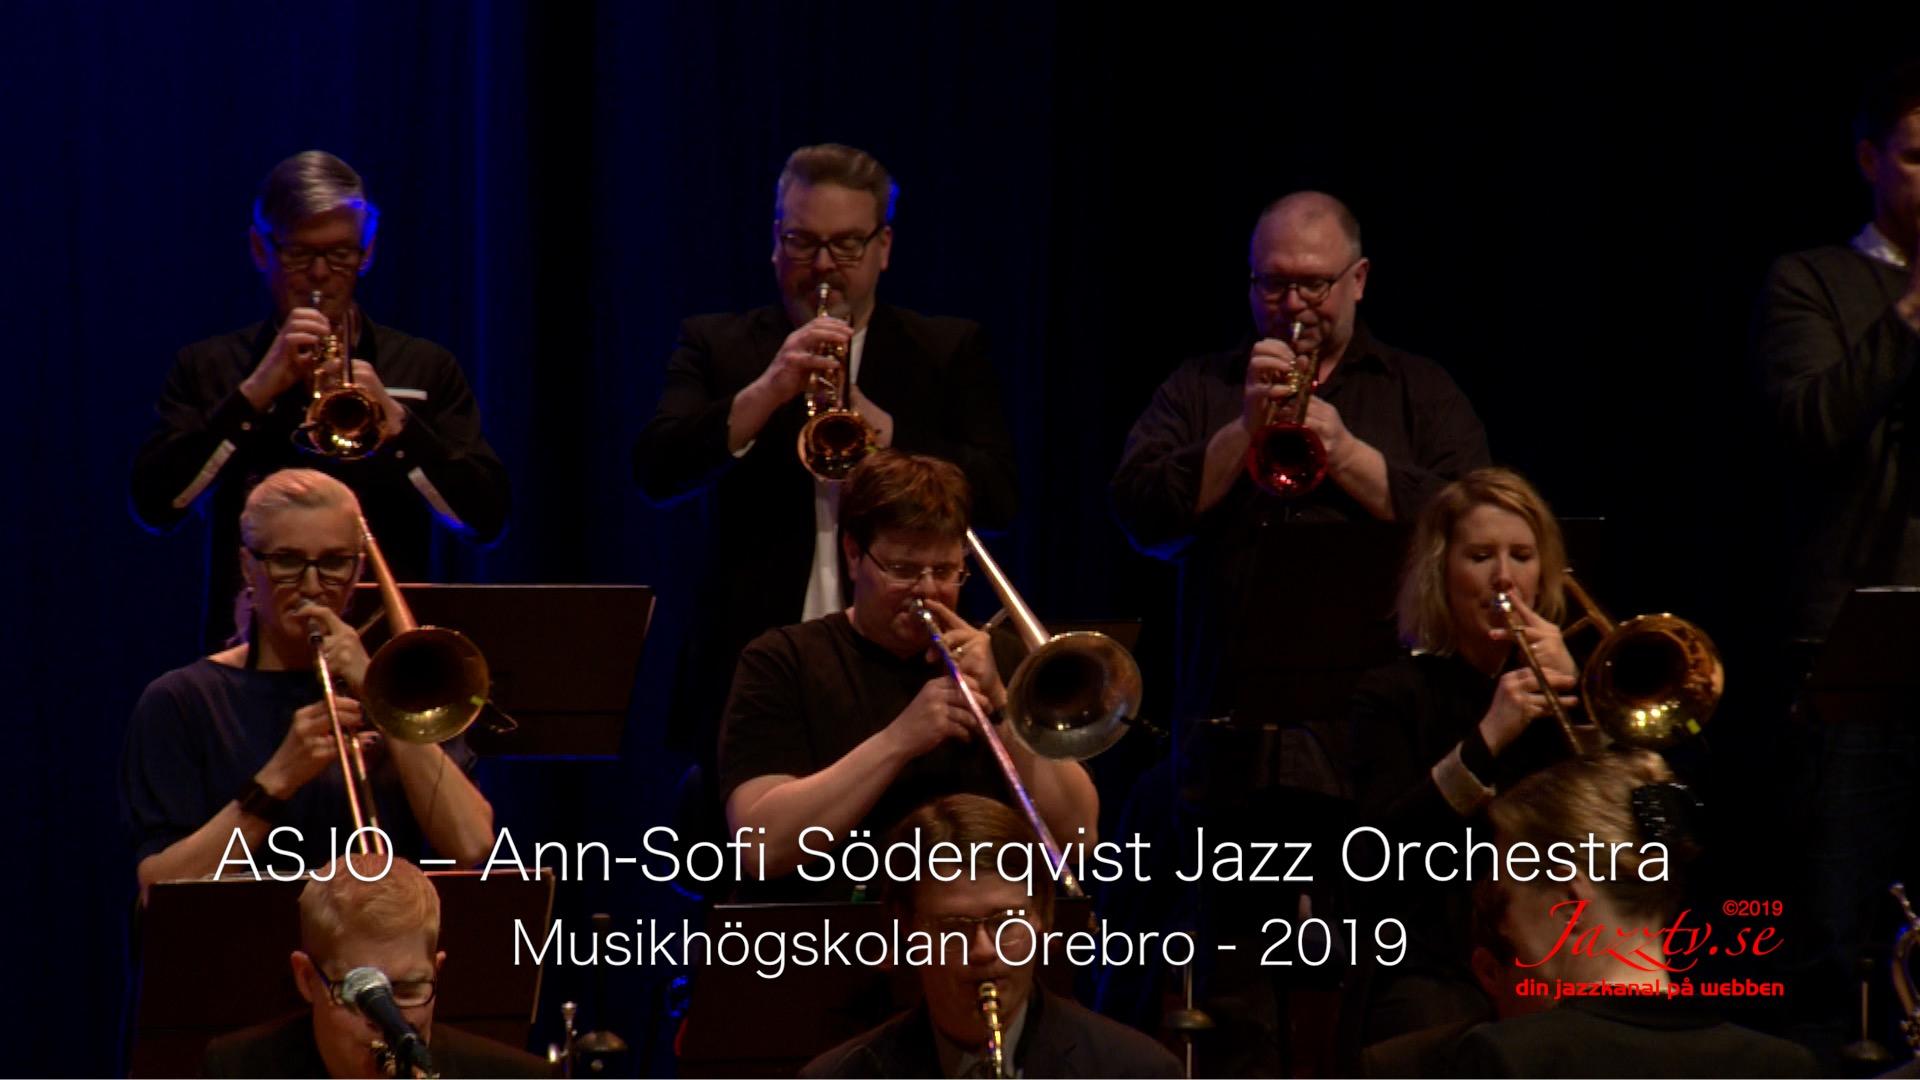 ASJO - Ann-Sofi Söderqvist Jazzorkester